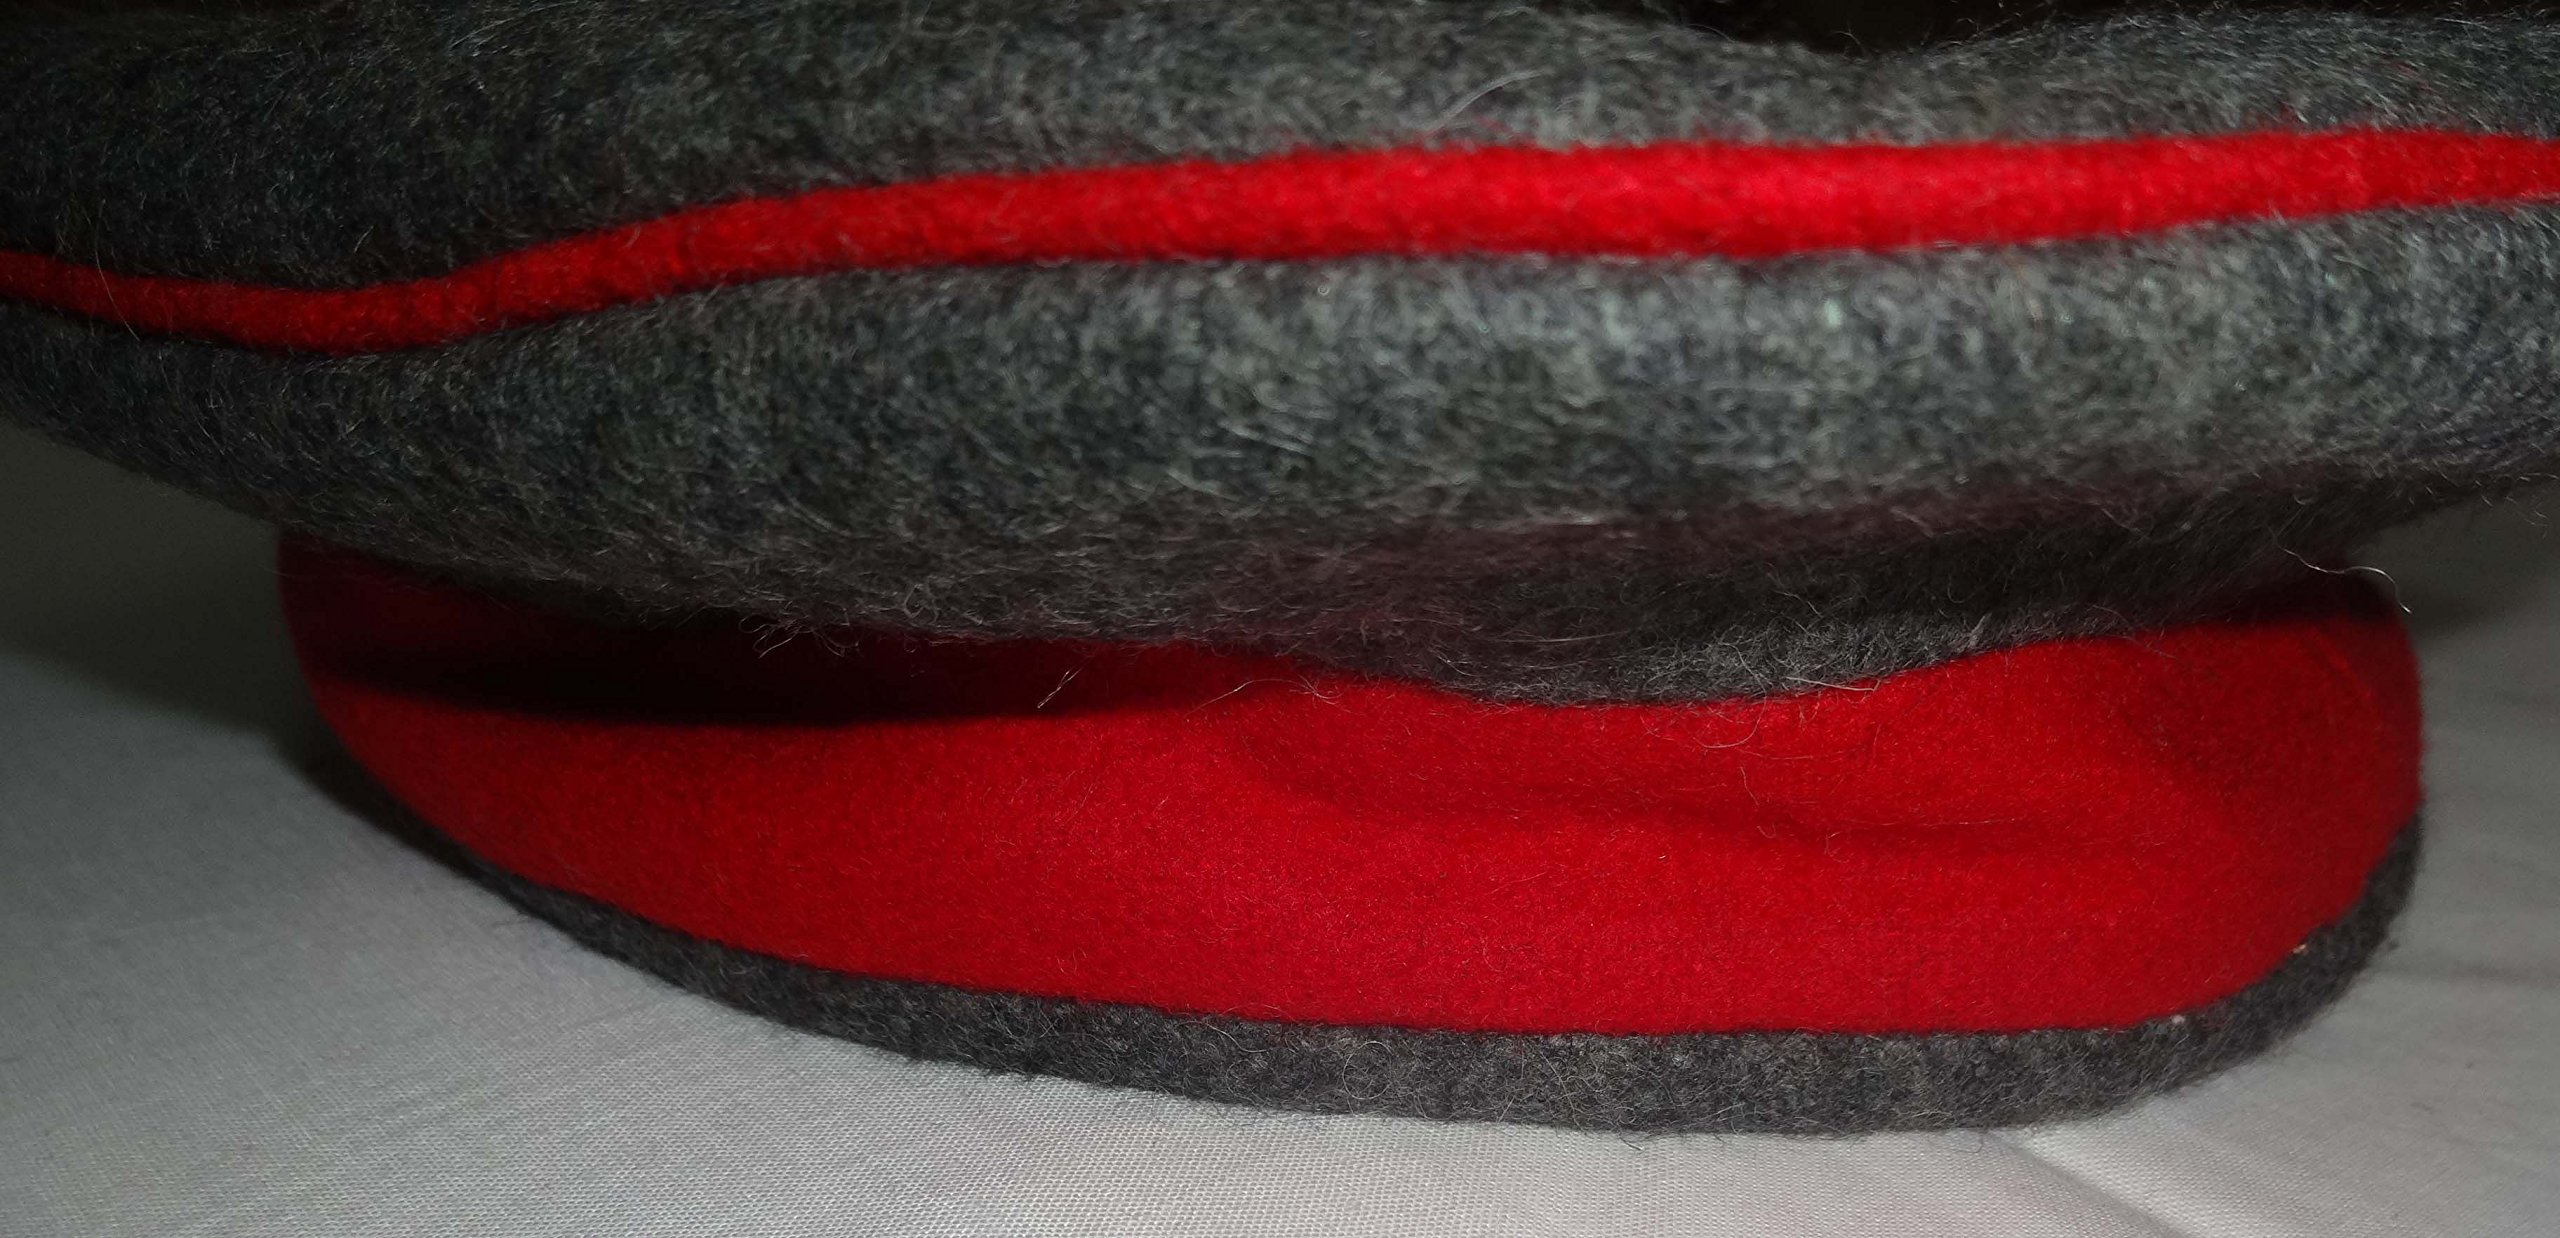 warreplica Kratzchen Field Cap M10 / Monarchy Empire Uniform Cap Size 60cm (US Size 7.50)